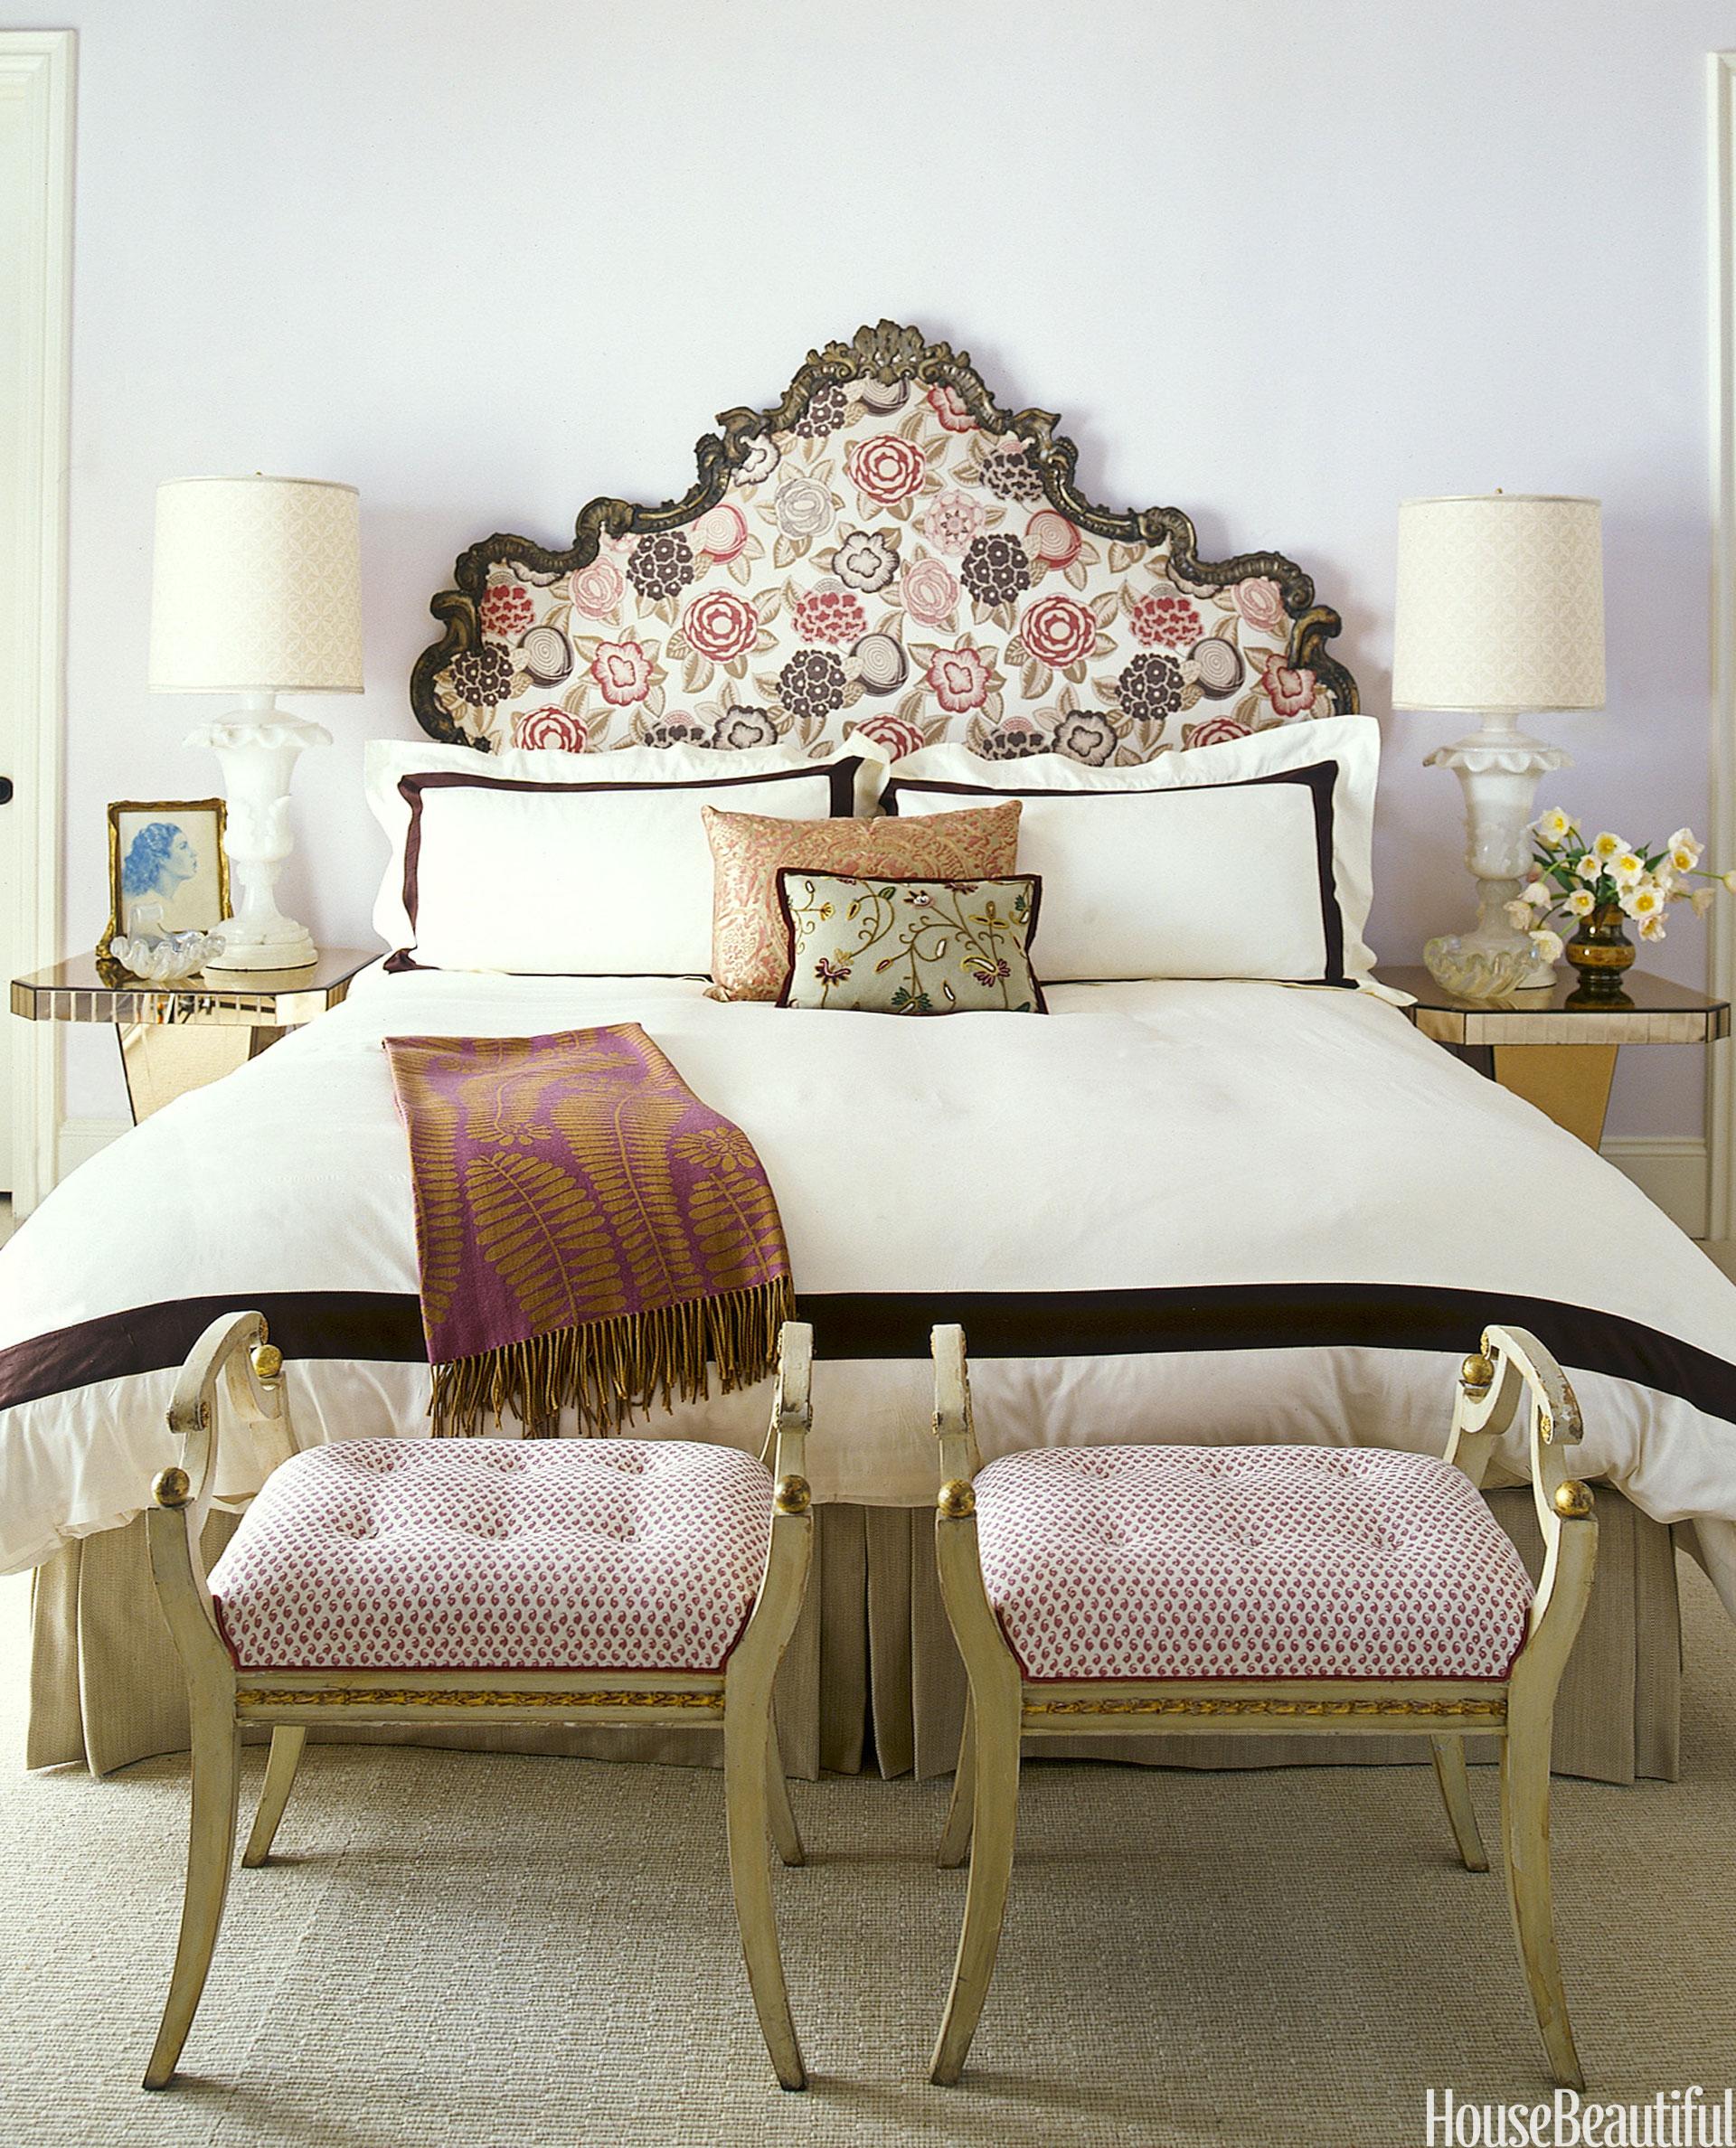 Romantic Bedroom Decor: Ideas For Sexy Bedroom Decor